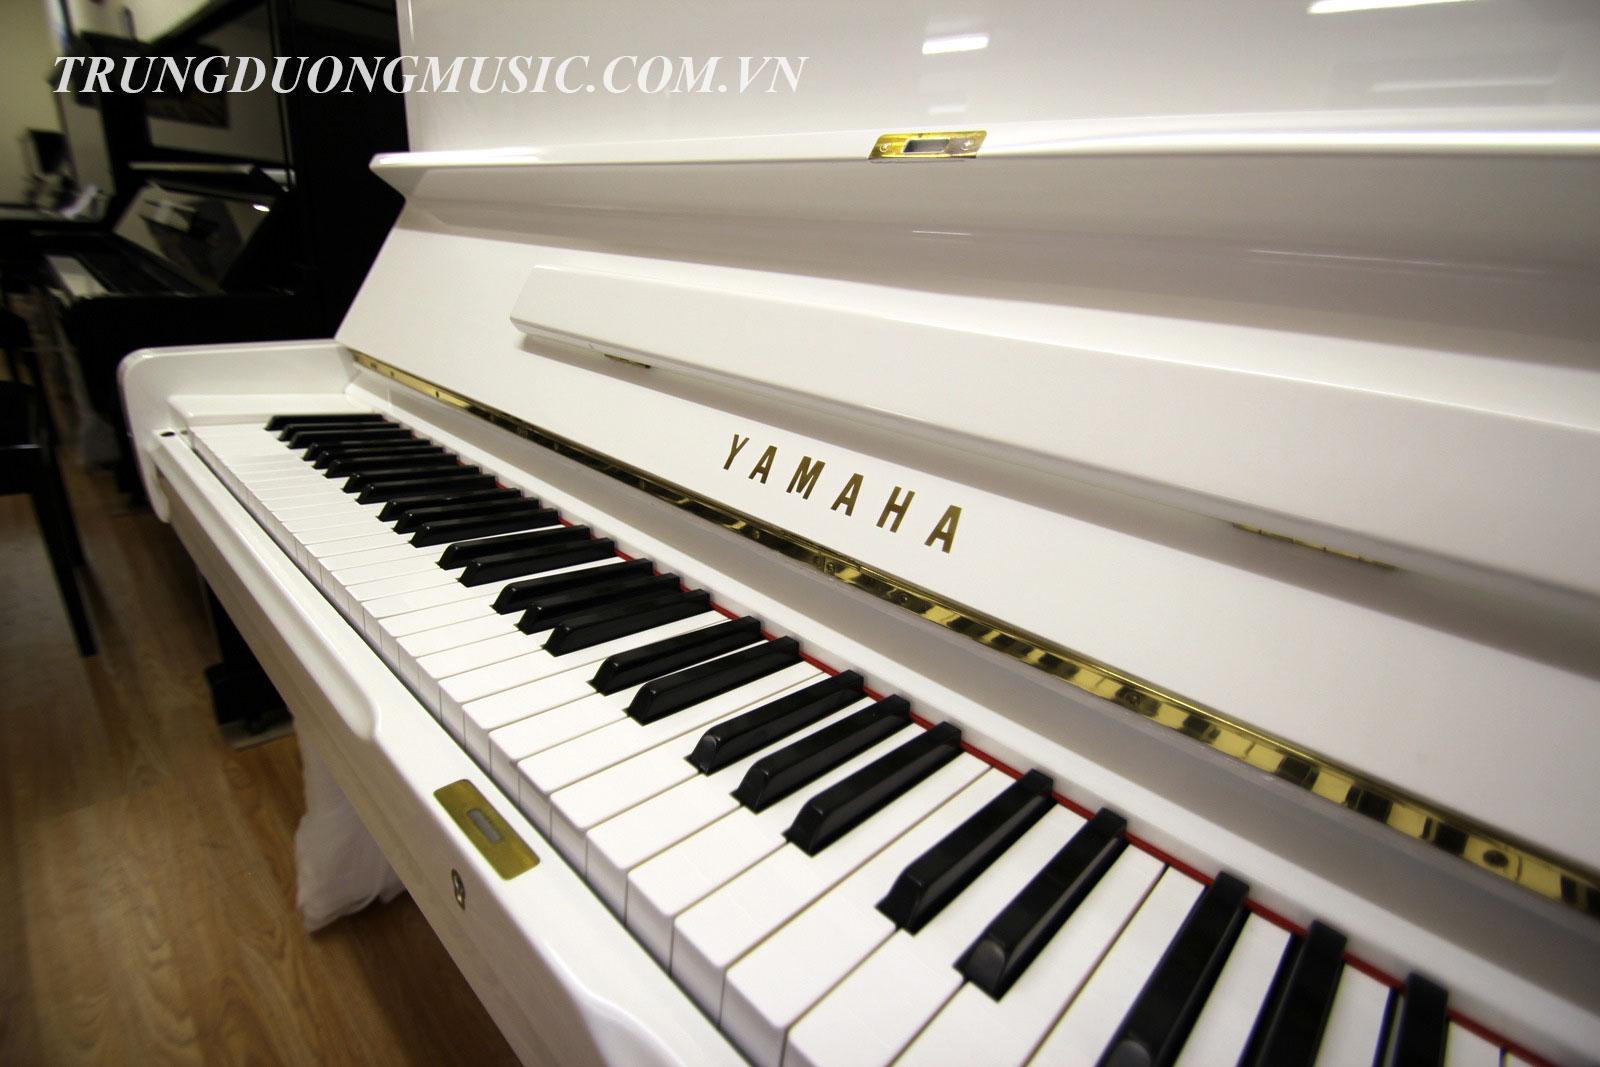 Tìm kiếm địa chỉ bán đàn piano yamaha uy tín